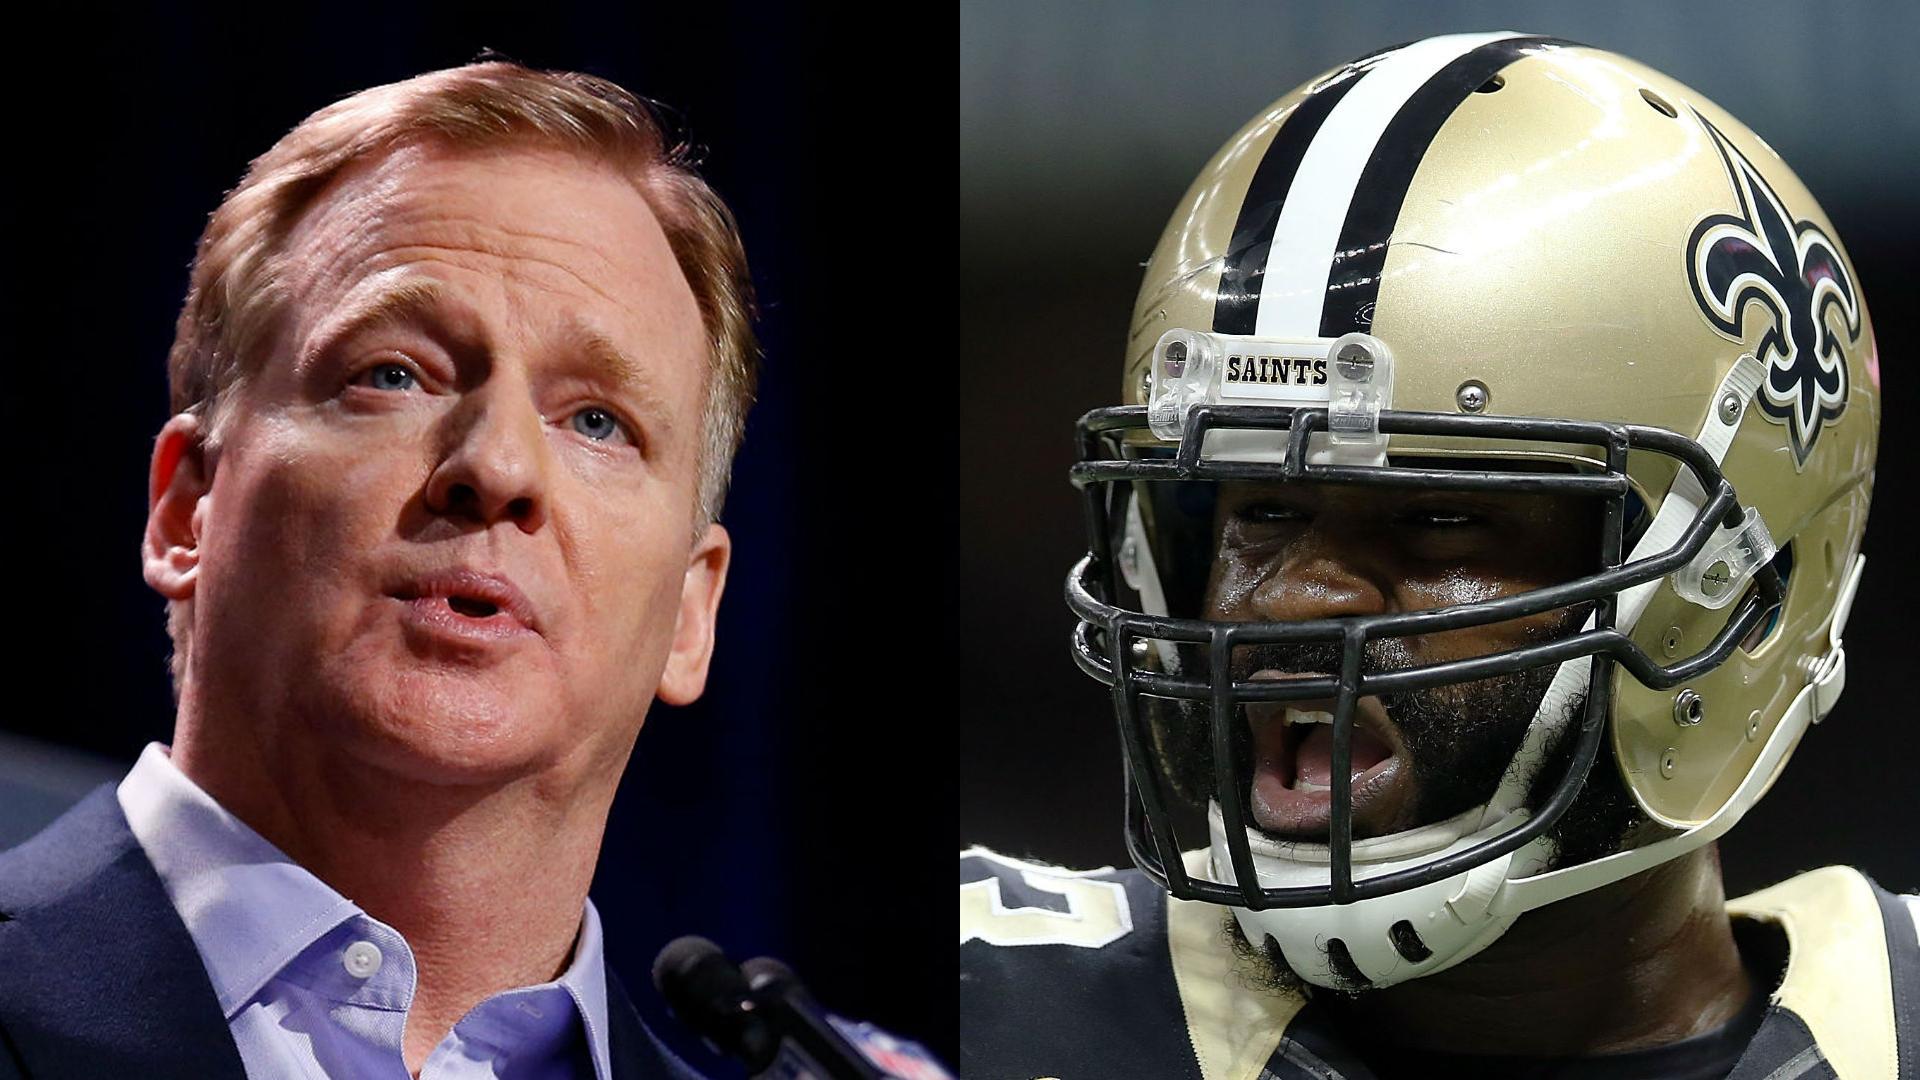 Junior Galette claims he's been 'blackballed' from NFL in open letter to Roger Goodell 1